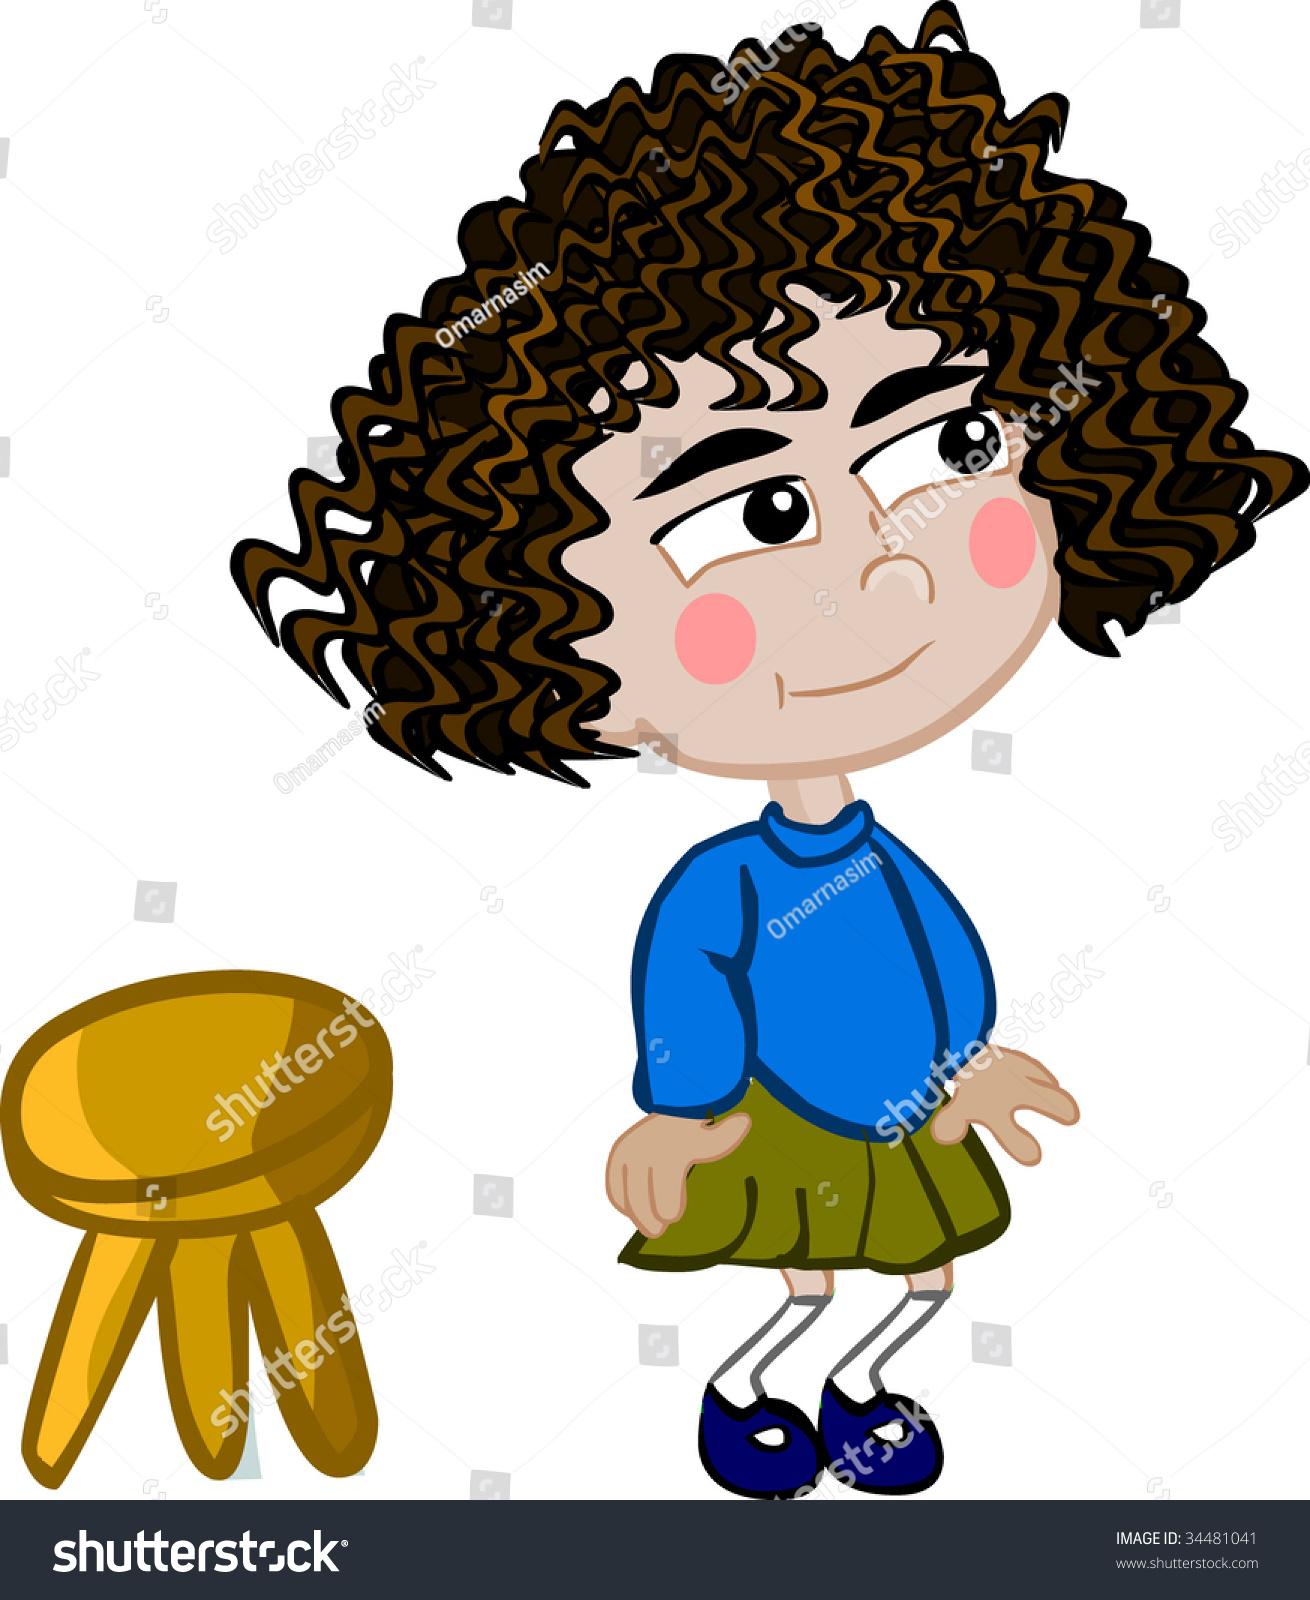 Cartoon Girl And A Stool Stock Vector Illustration